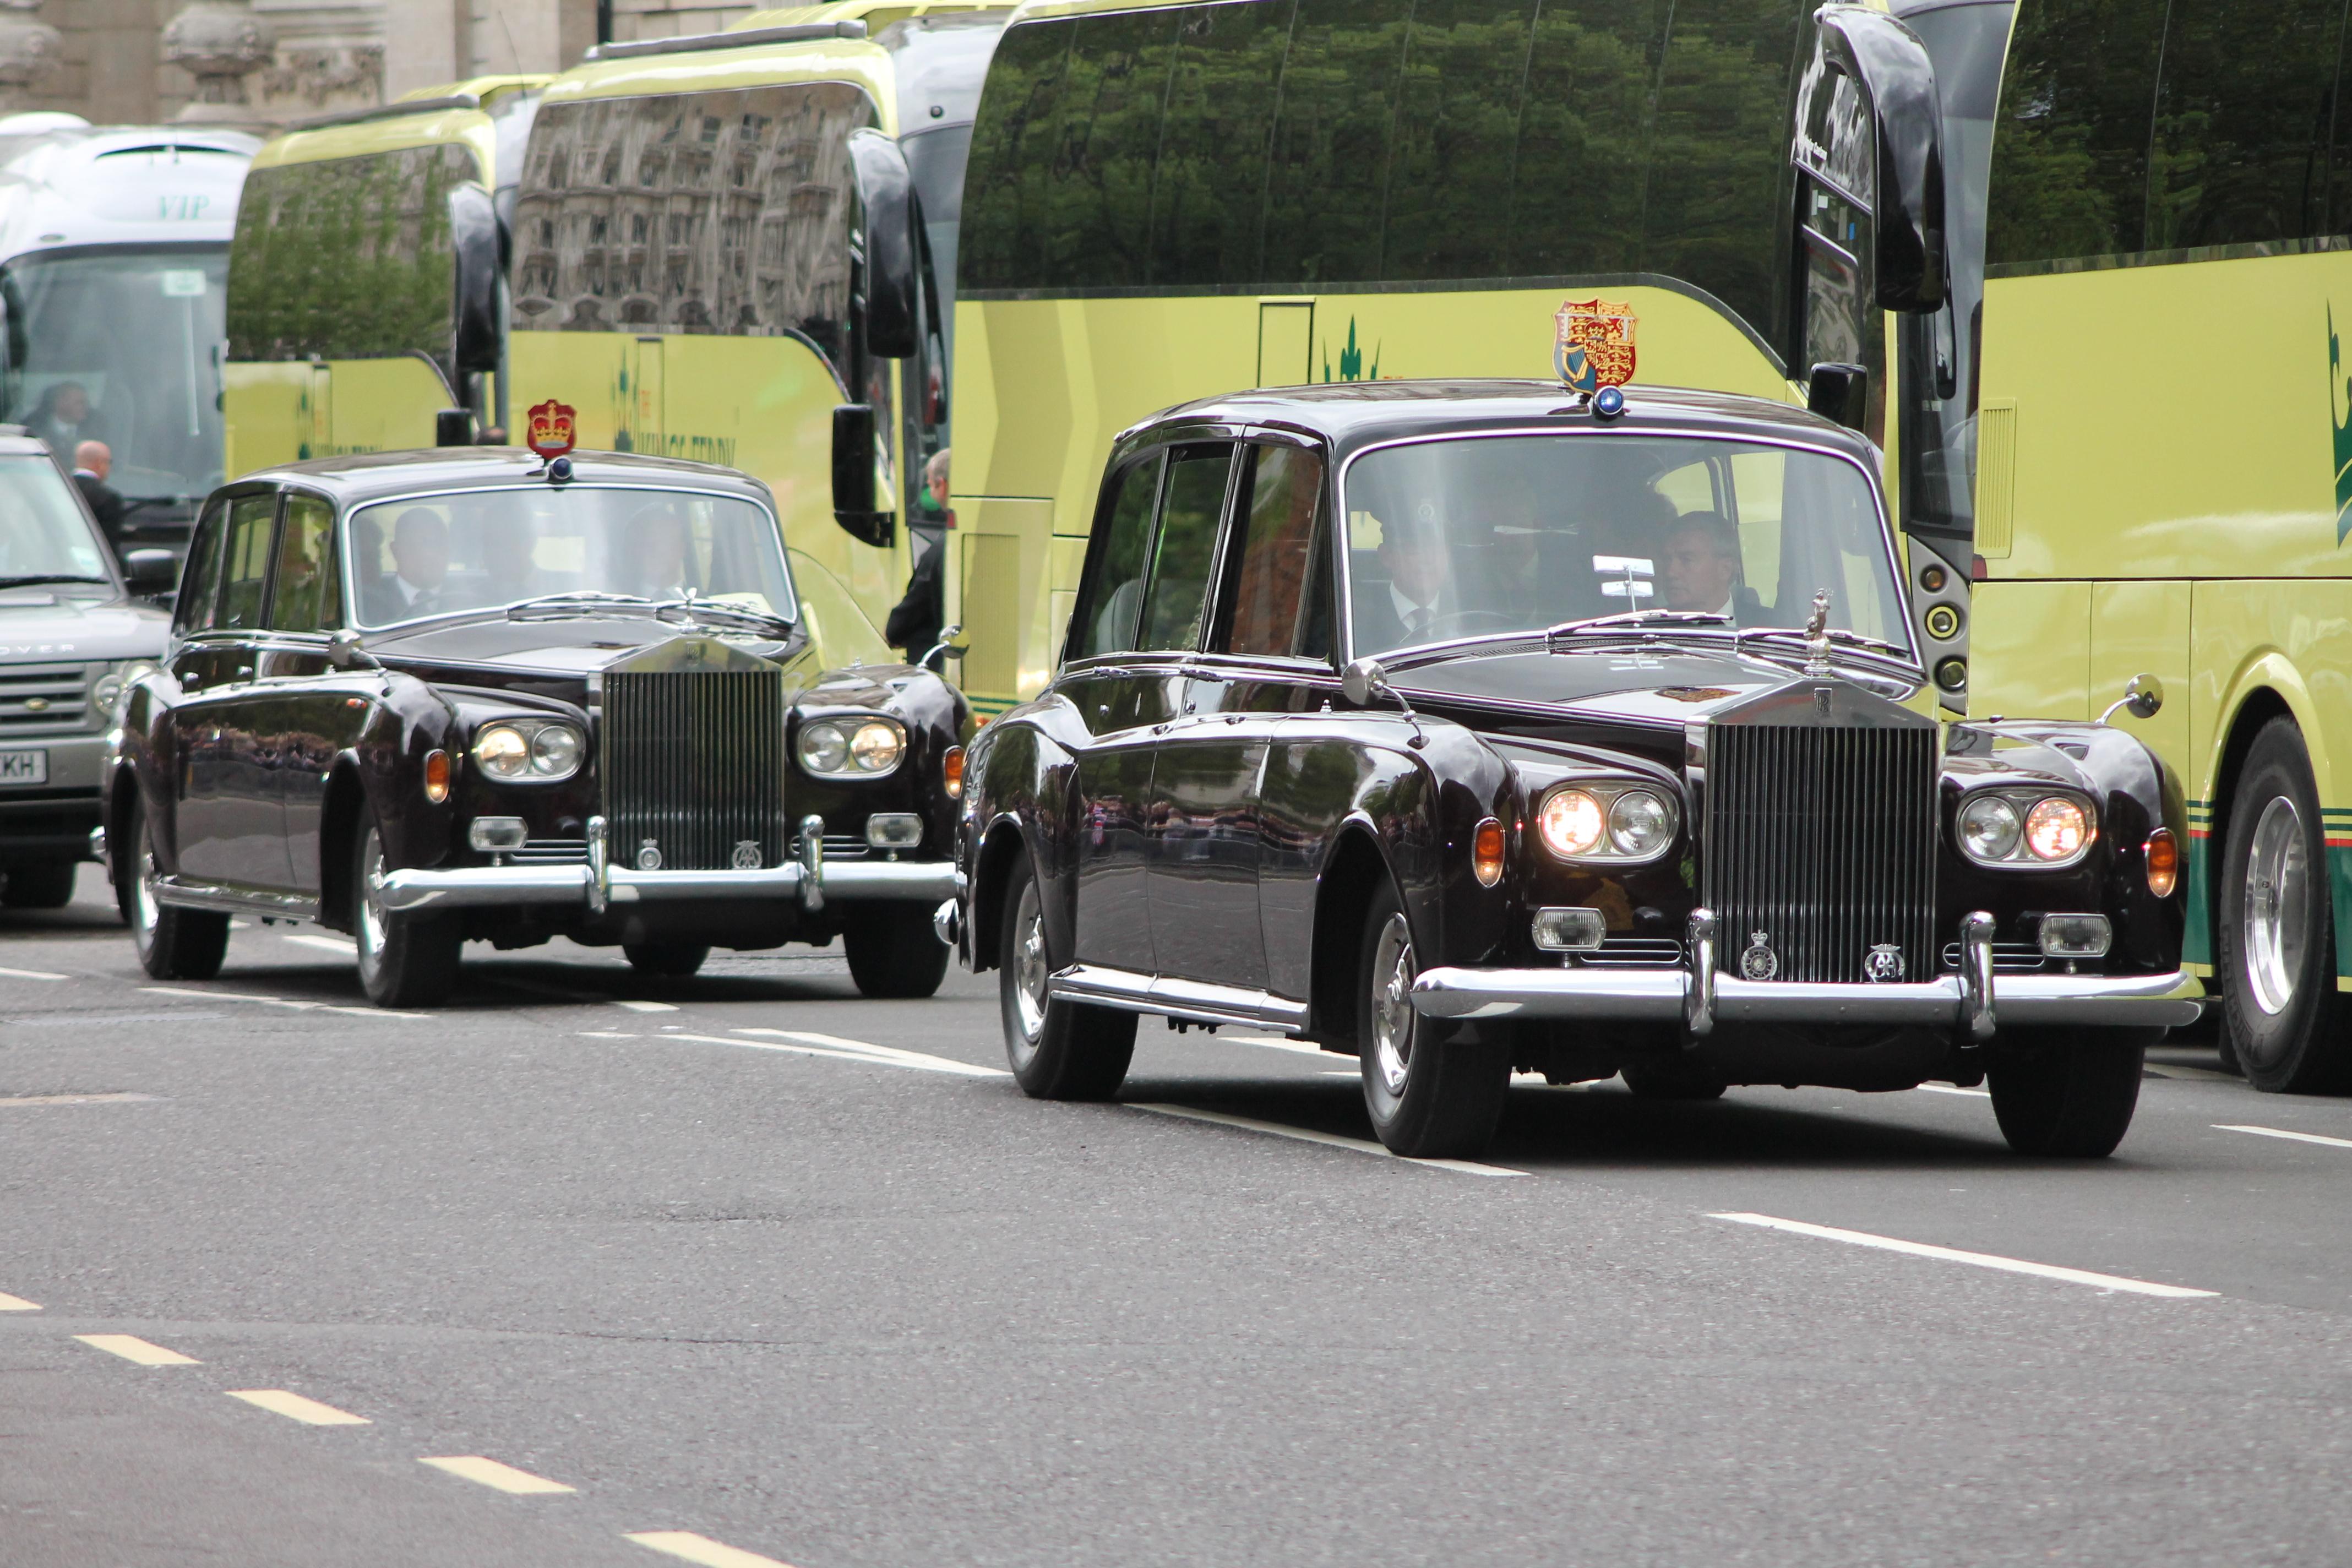 File:Royal cars.JPG - Wikimedia Commons